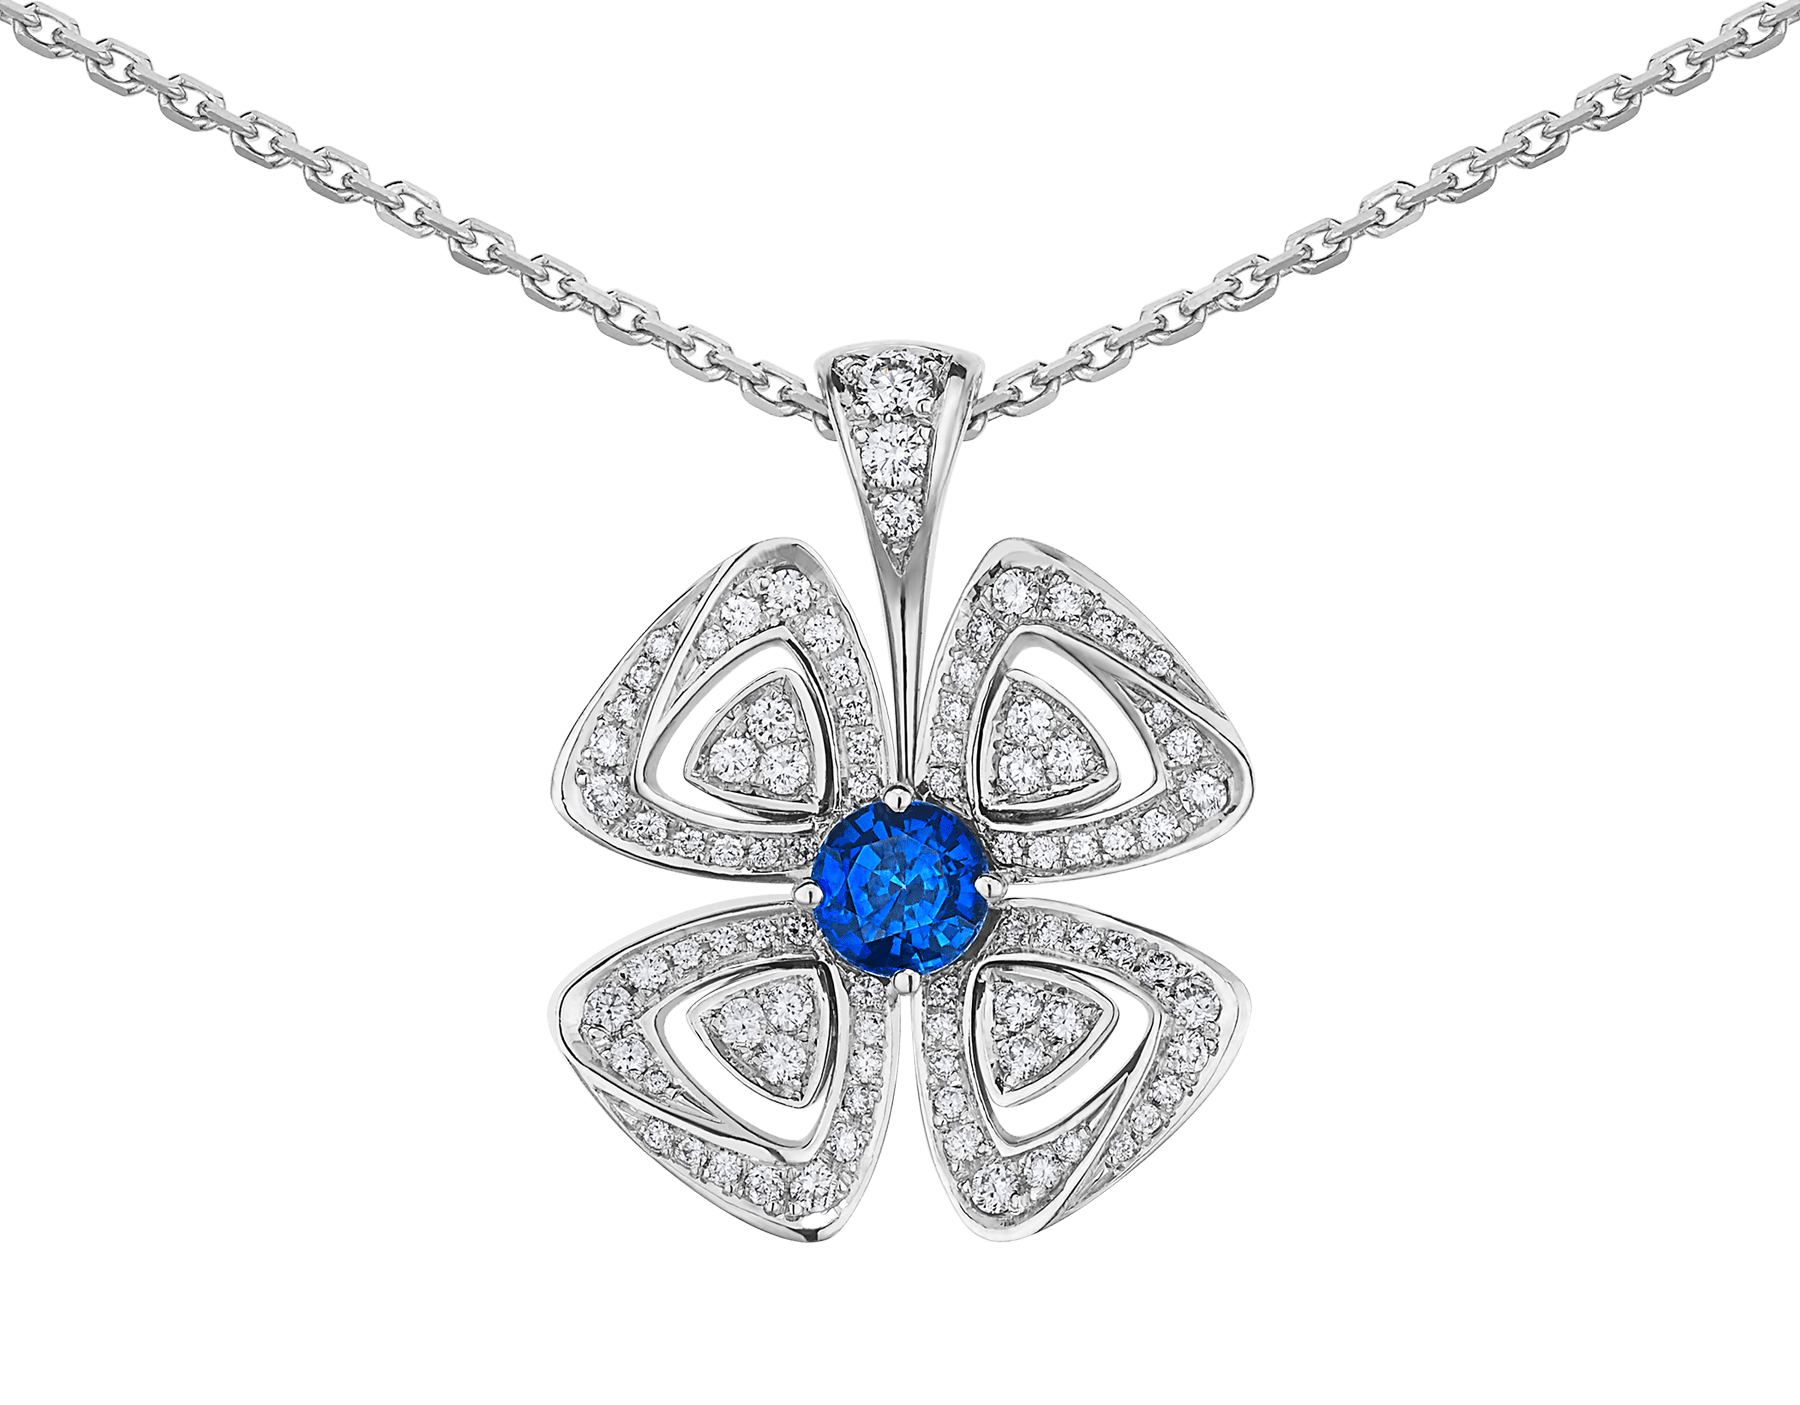 Fiorever 18K 白金項鍊,鑲飾 1 顆明亮型切割藍寶石(0.43 克拉)和密鑲鑽石(0.31 克拉)。 358426 image 3